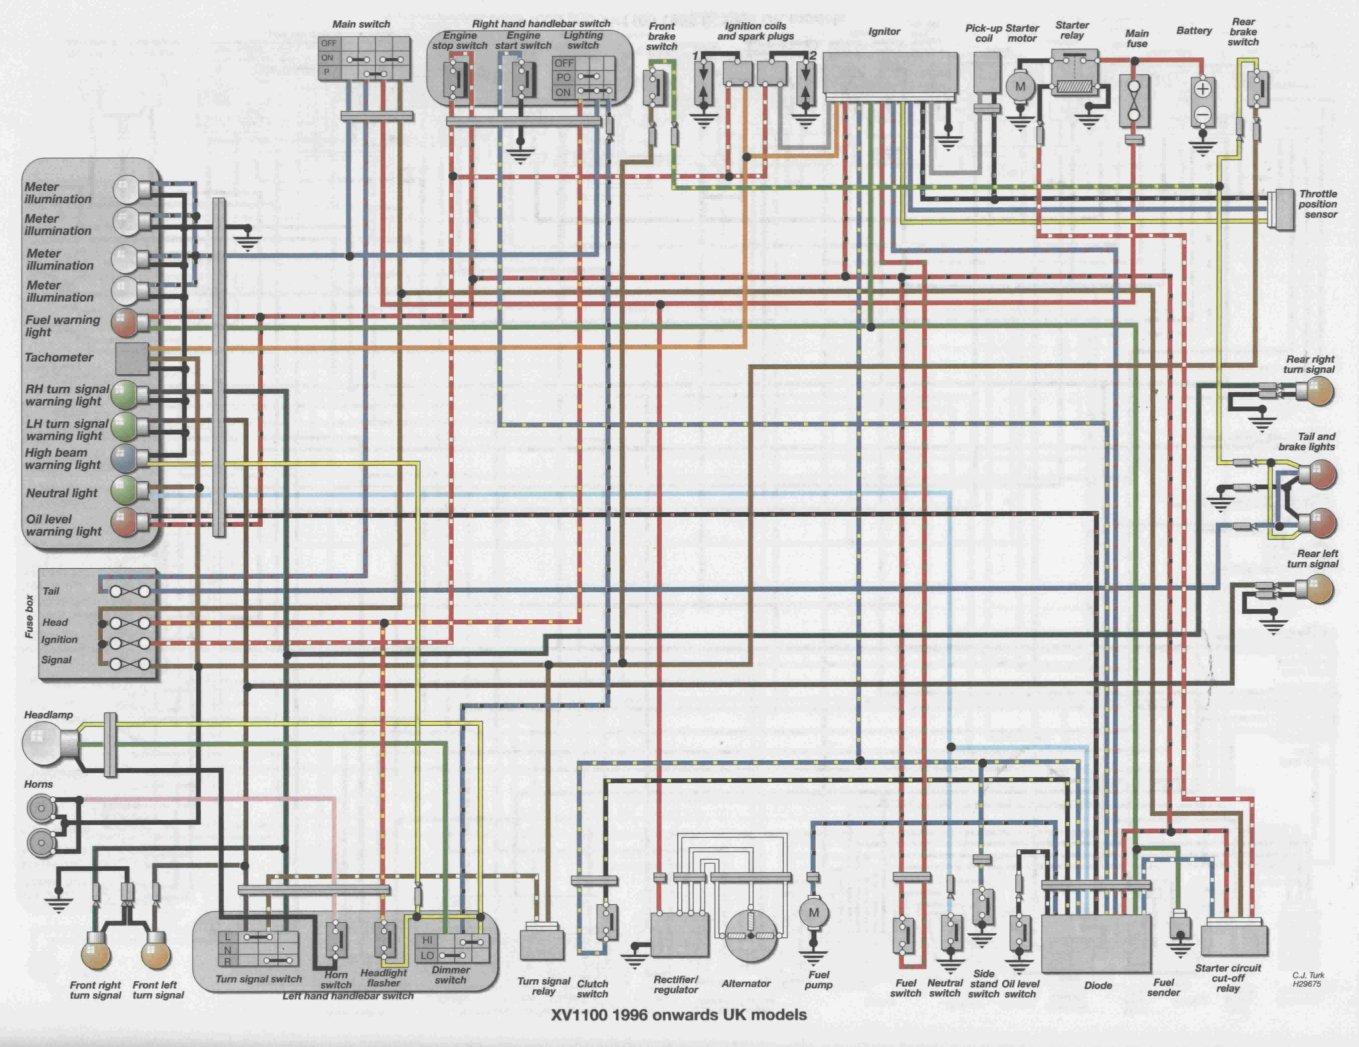 1996 yamaha virago wiring diagram efcaviation 1996 yamaha virago 750 wiring diagram wiring diagram 512 asfbconference2016 Images